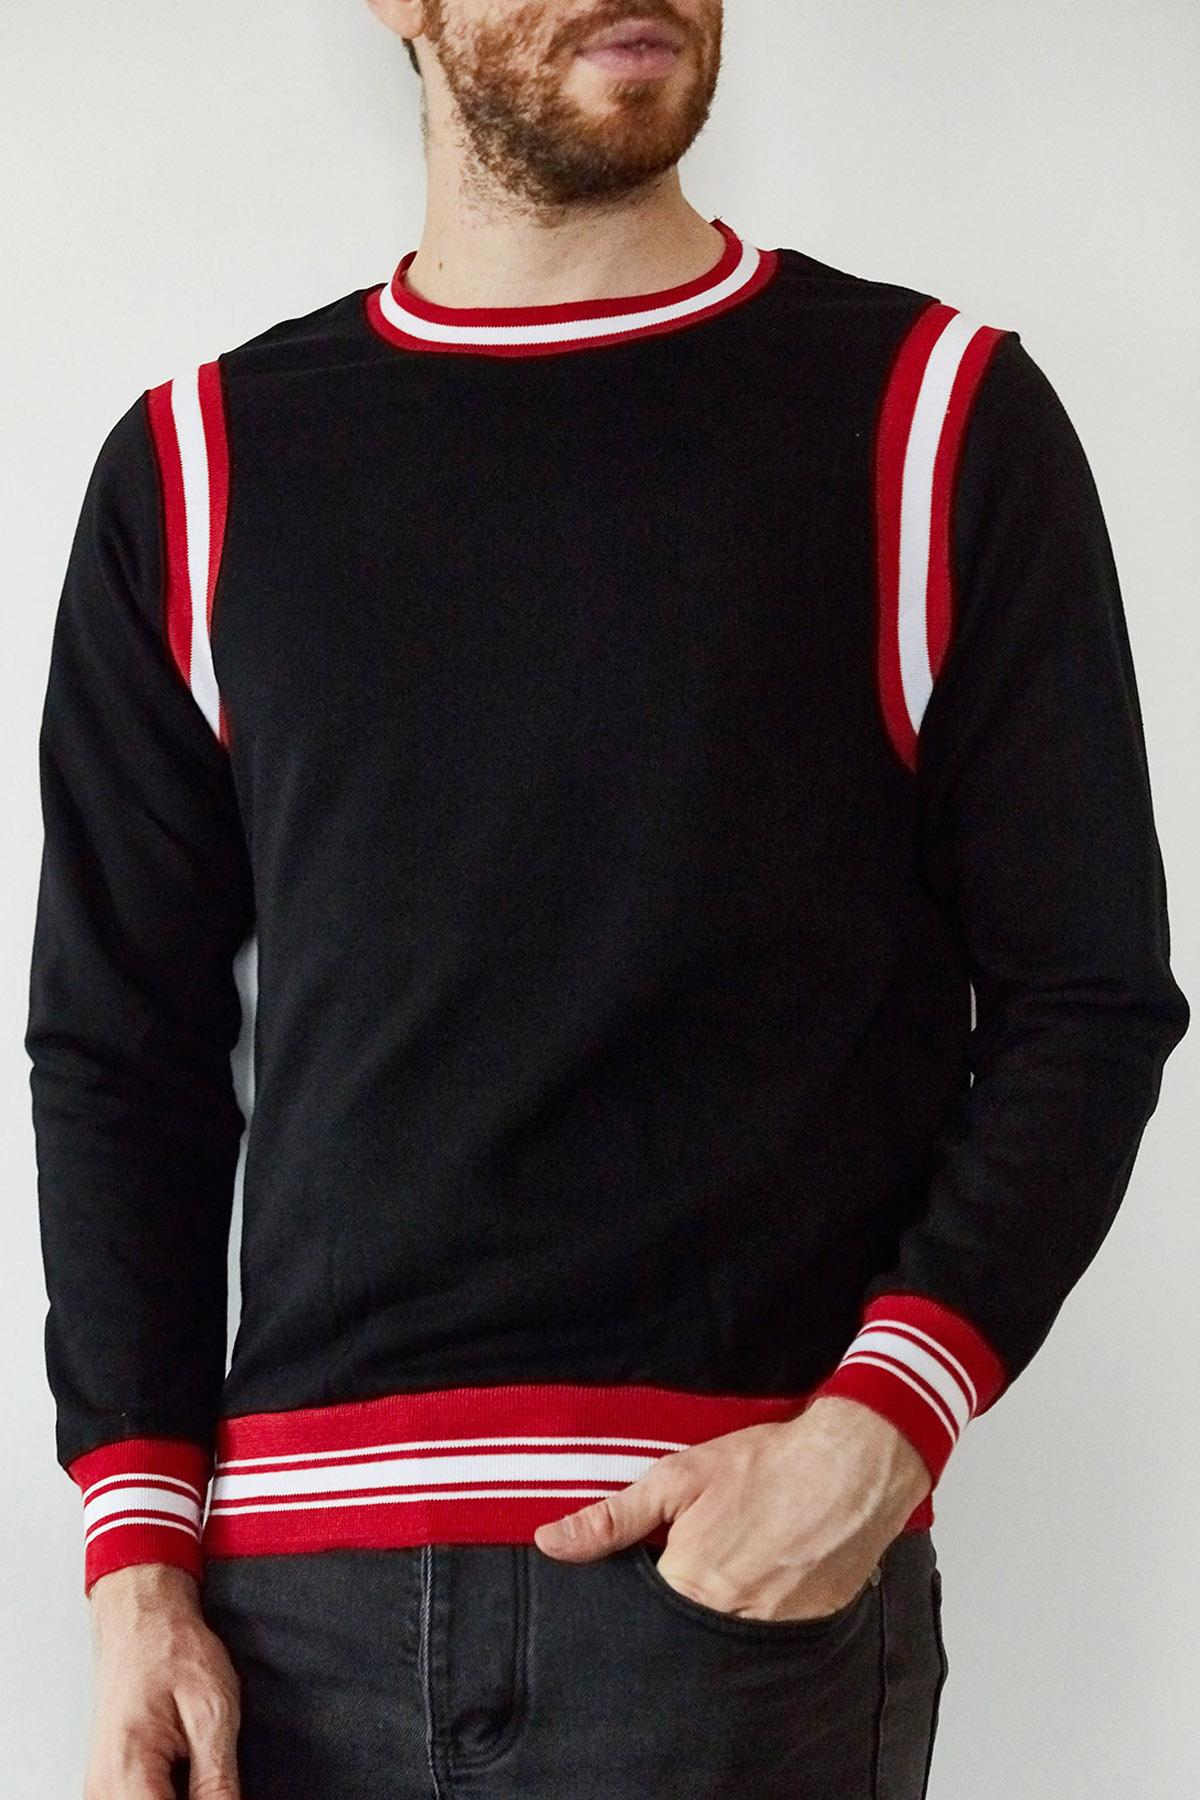 XHAN - Siyah & Kırmızı Şeritli Bisiklet Yaka Sweatshirt 1KXE8-44164-02